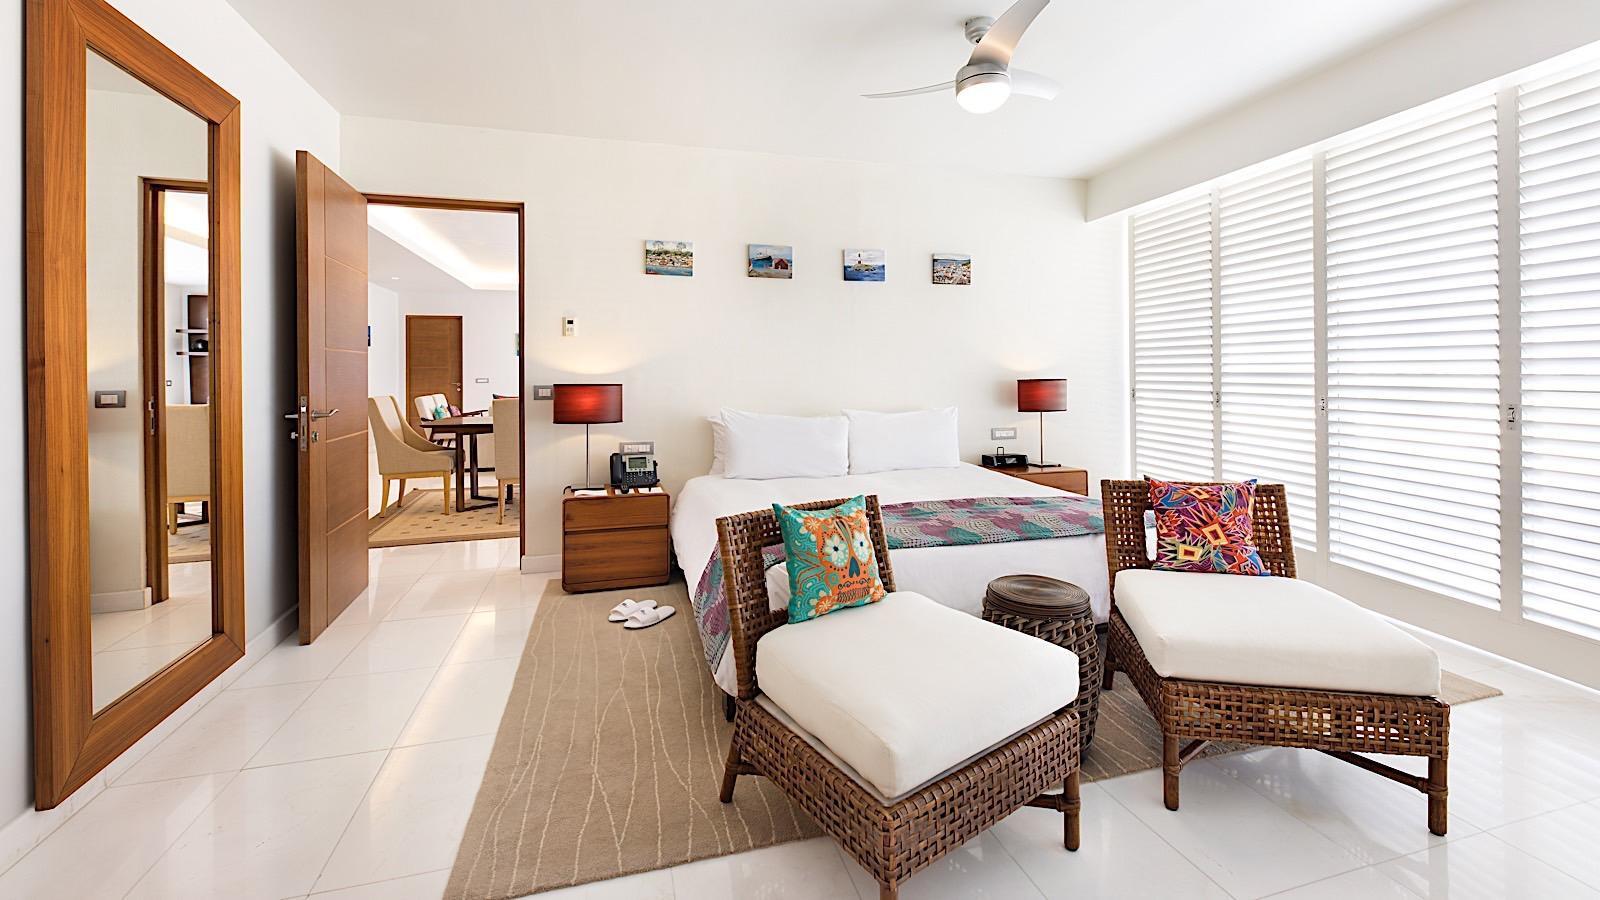 Bedroom in Imperial Suite at Mundo Imperial